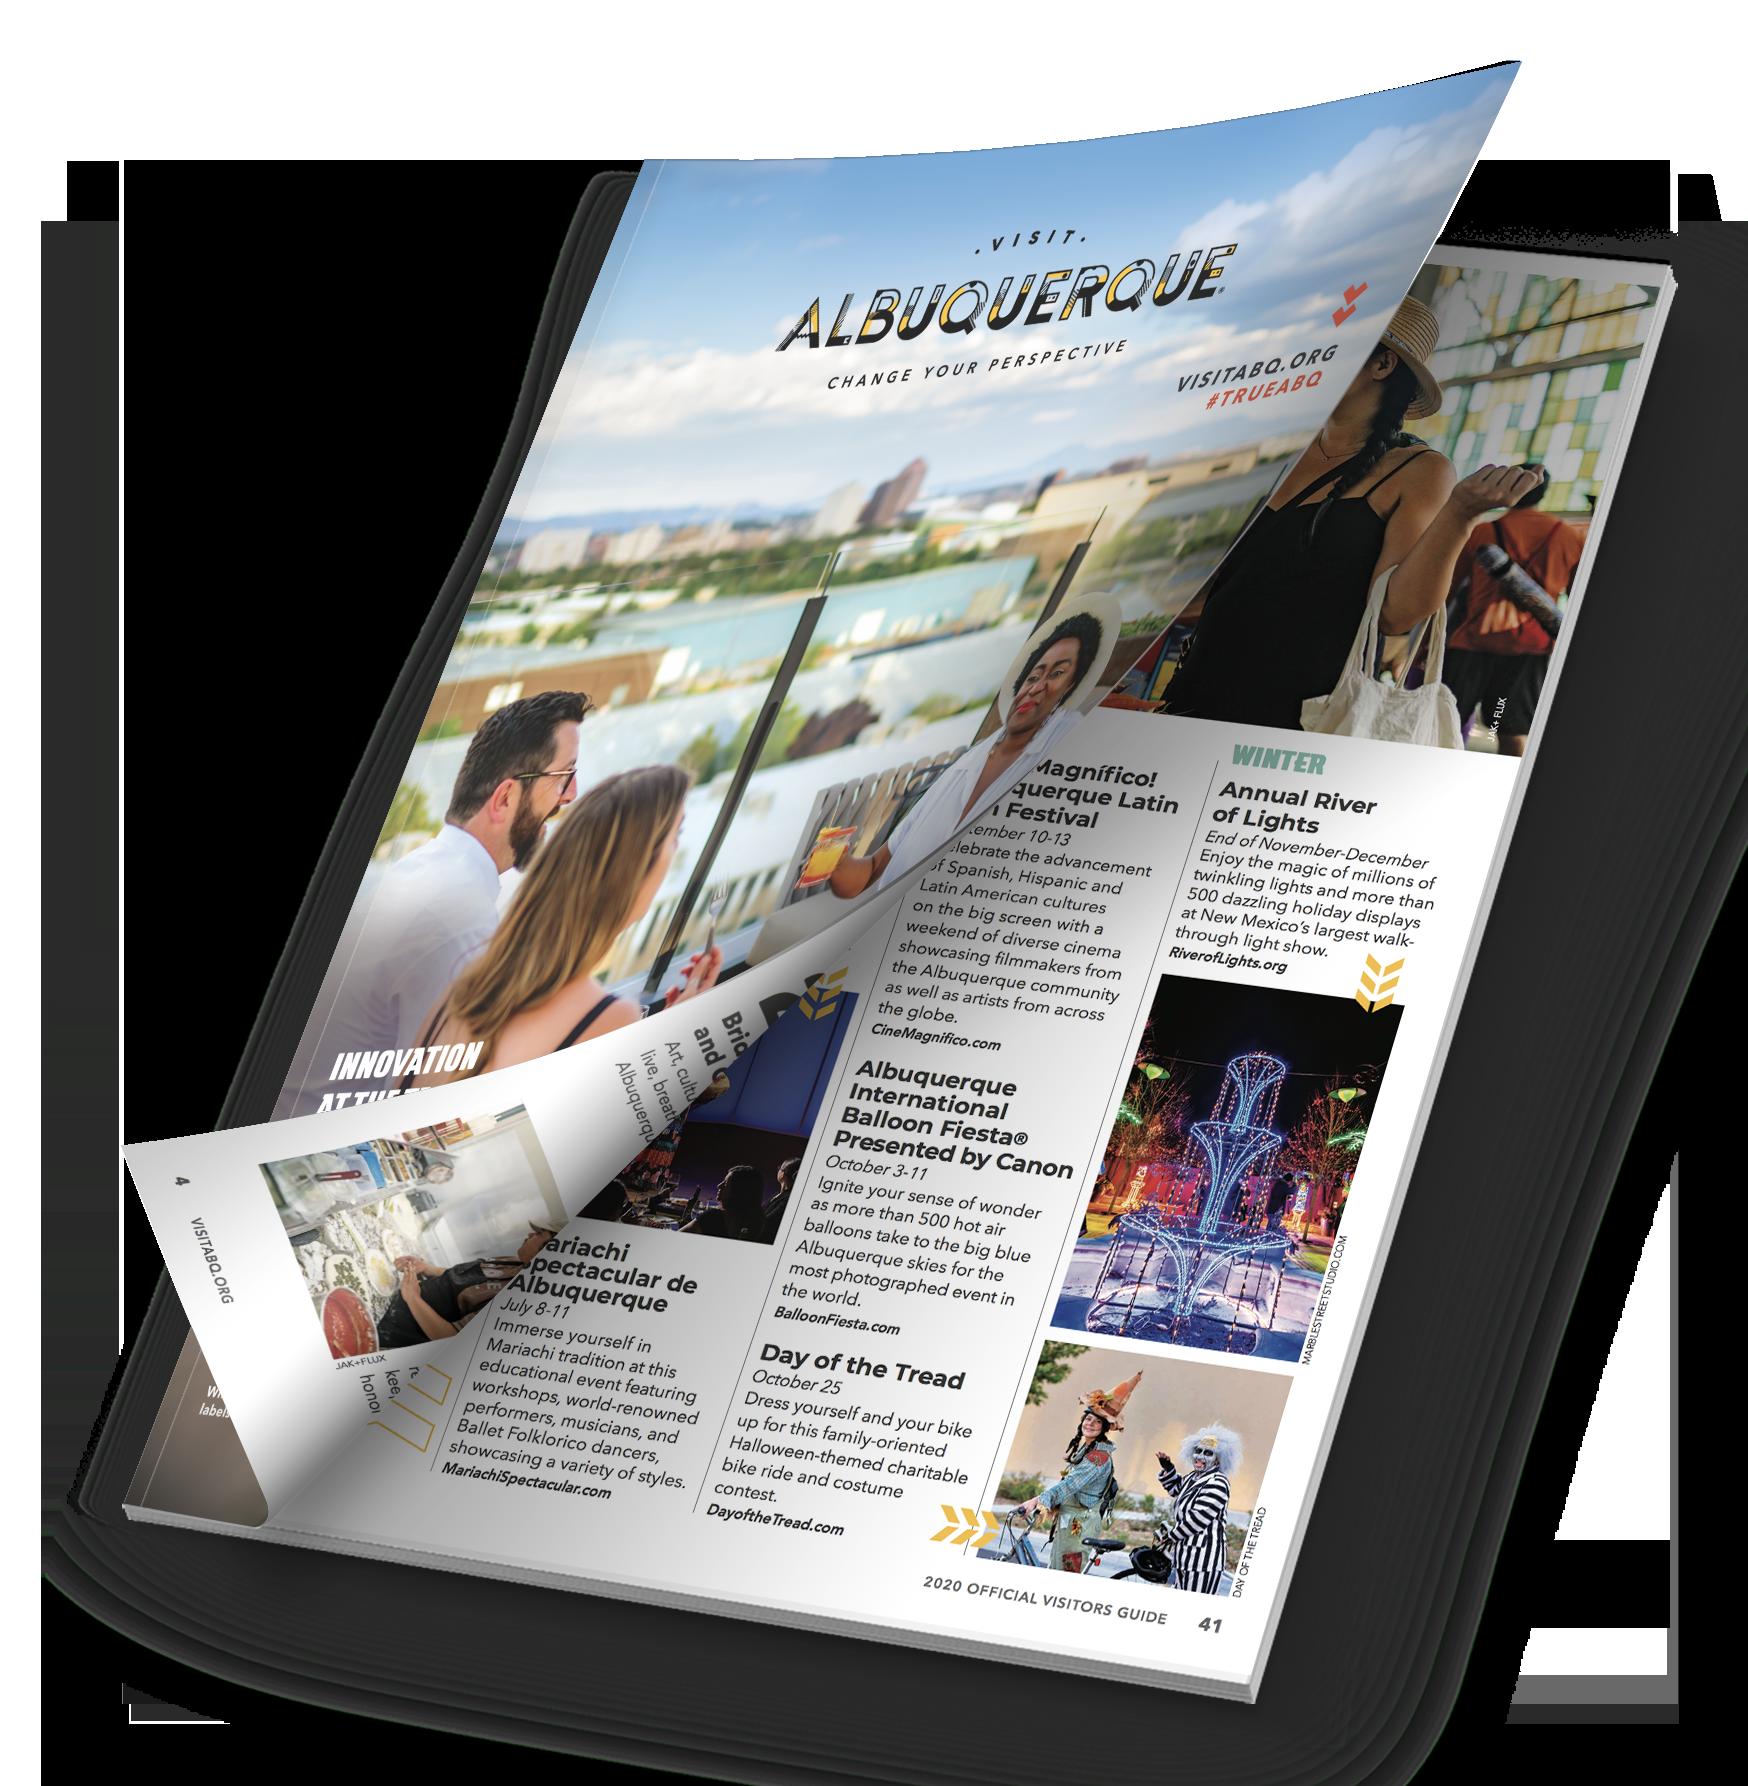 Guides For New Mexico Travel Visit Albuquerque